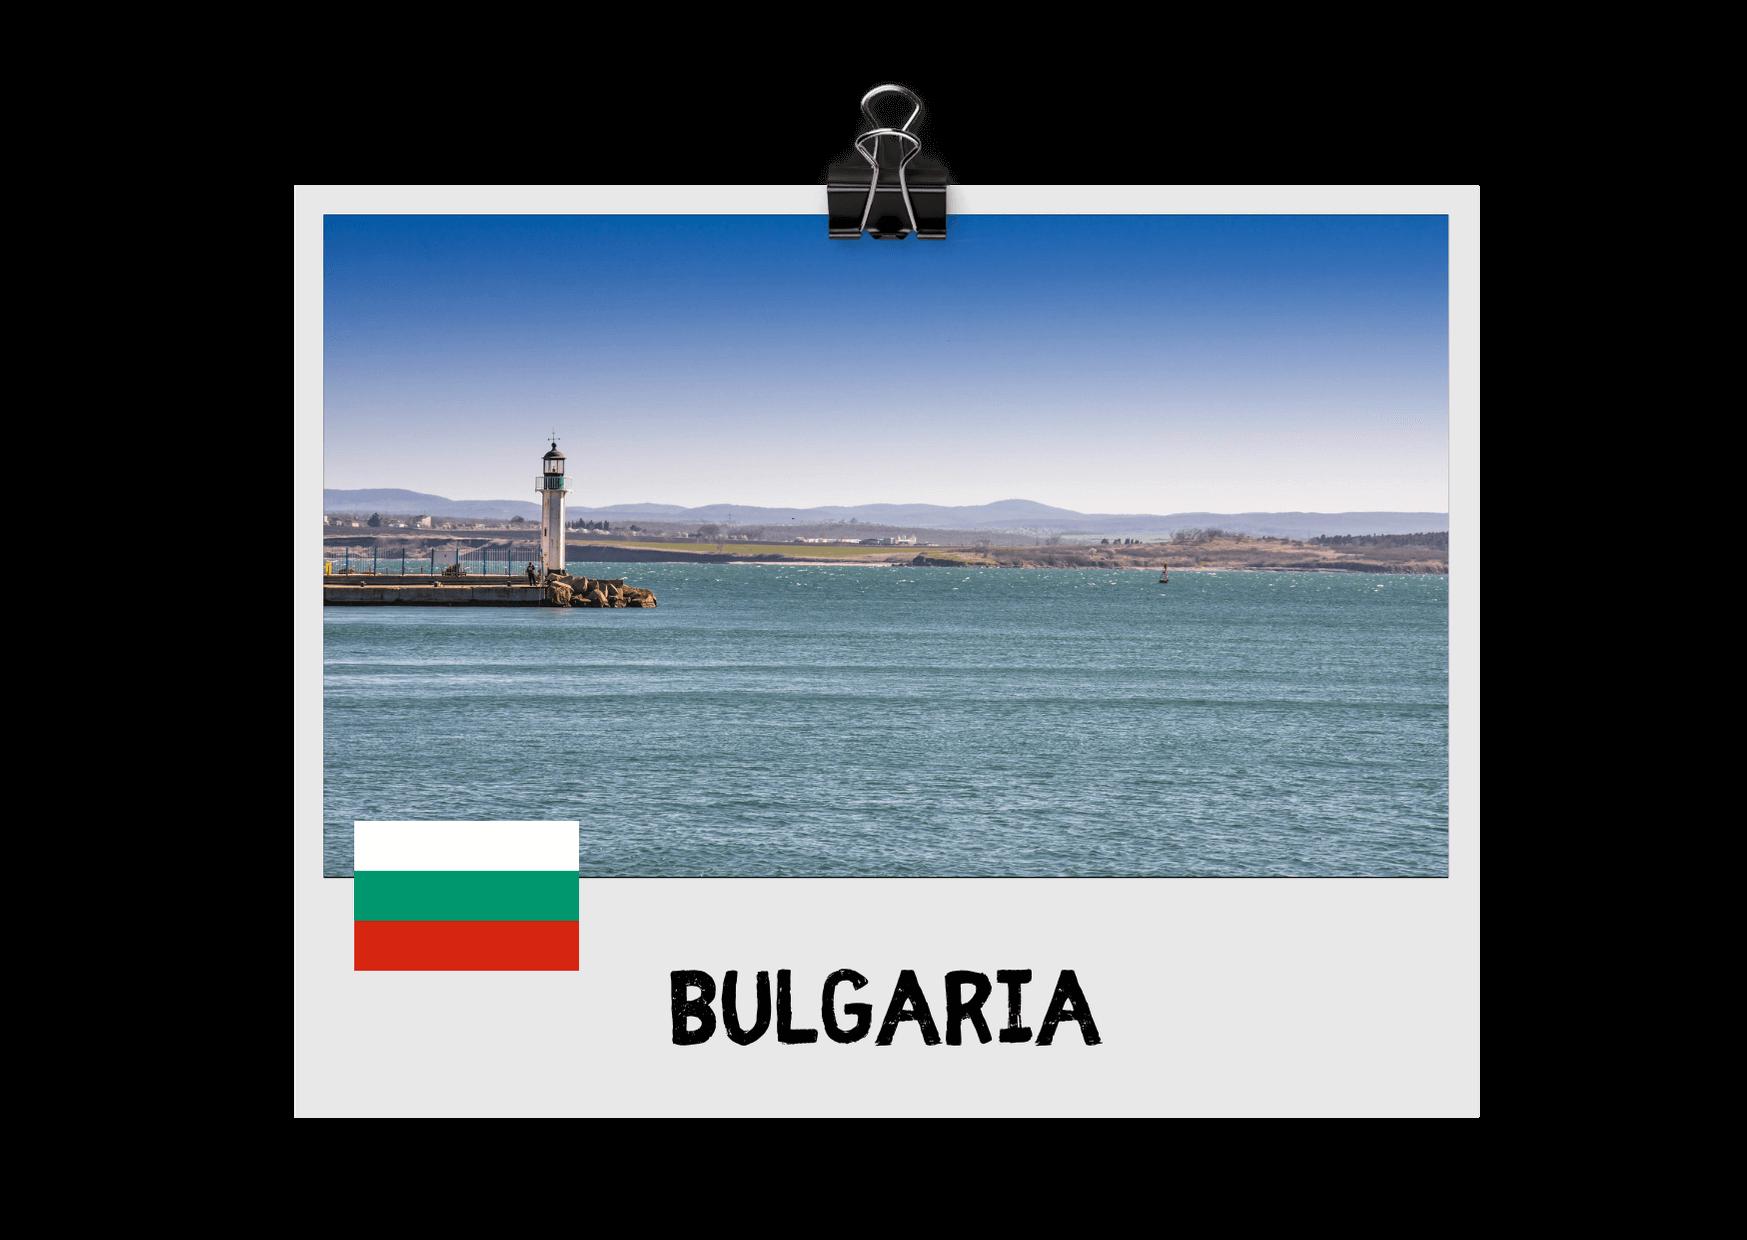 Van Life in Bulgaria